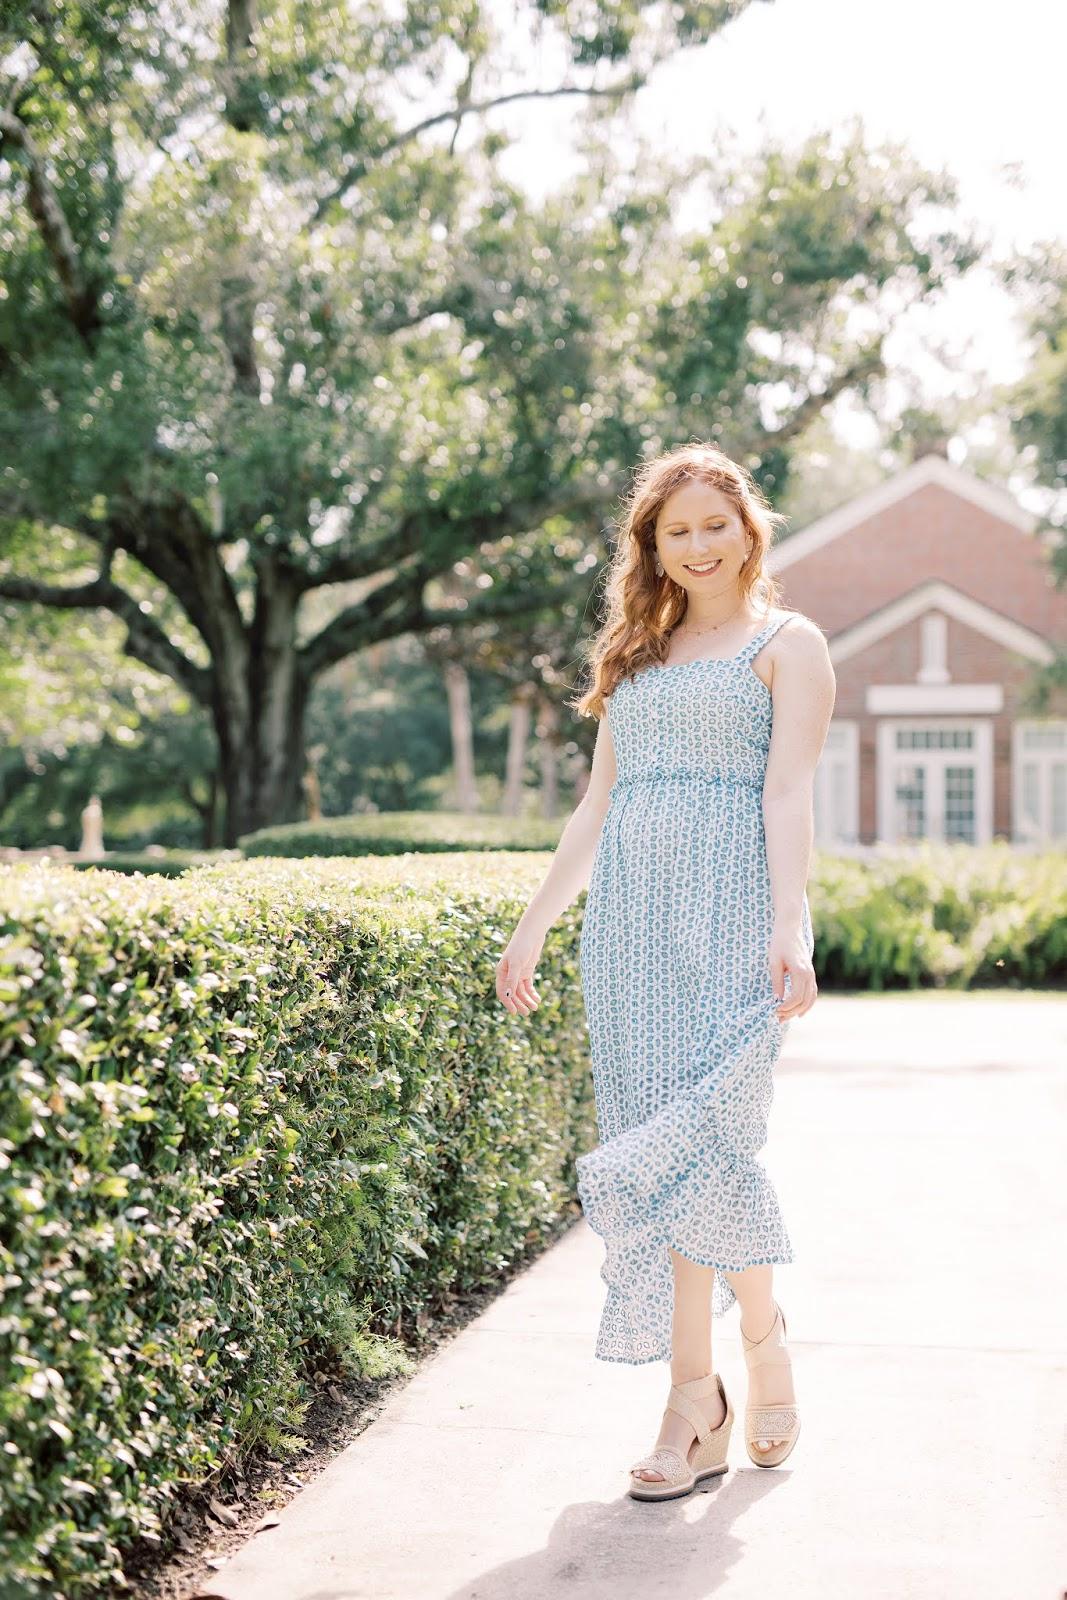 Tampa Blogger Amanda Burrows | Affordable by Amanda | Summer Eyelet Embroidery Dresses Under $50 | Darla Eyelet Dress Francesca's Semi-Annual Sale